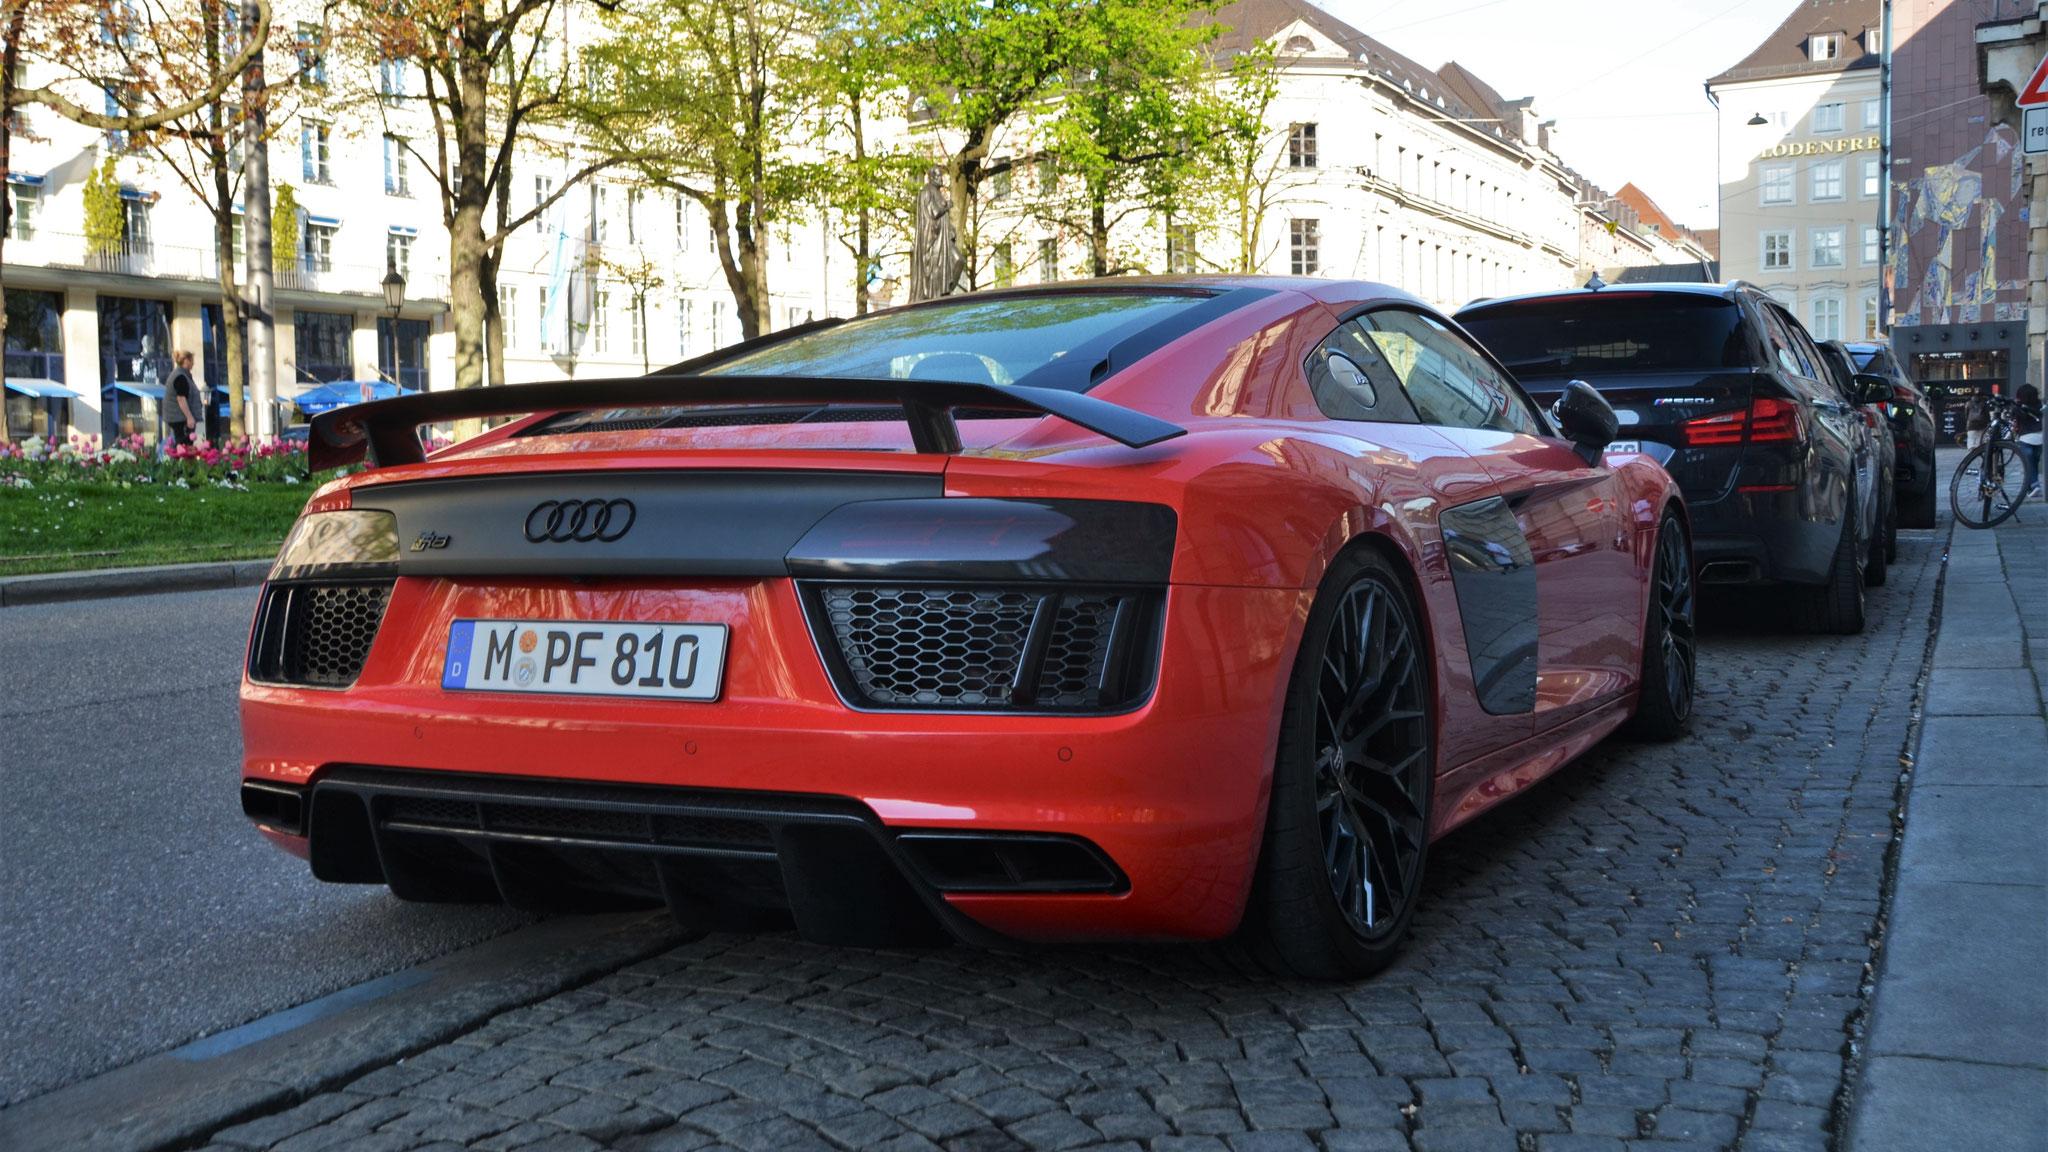 Audi R8 V10 - M-PF-810